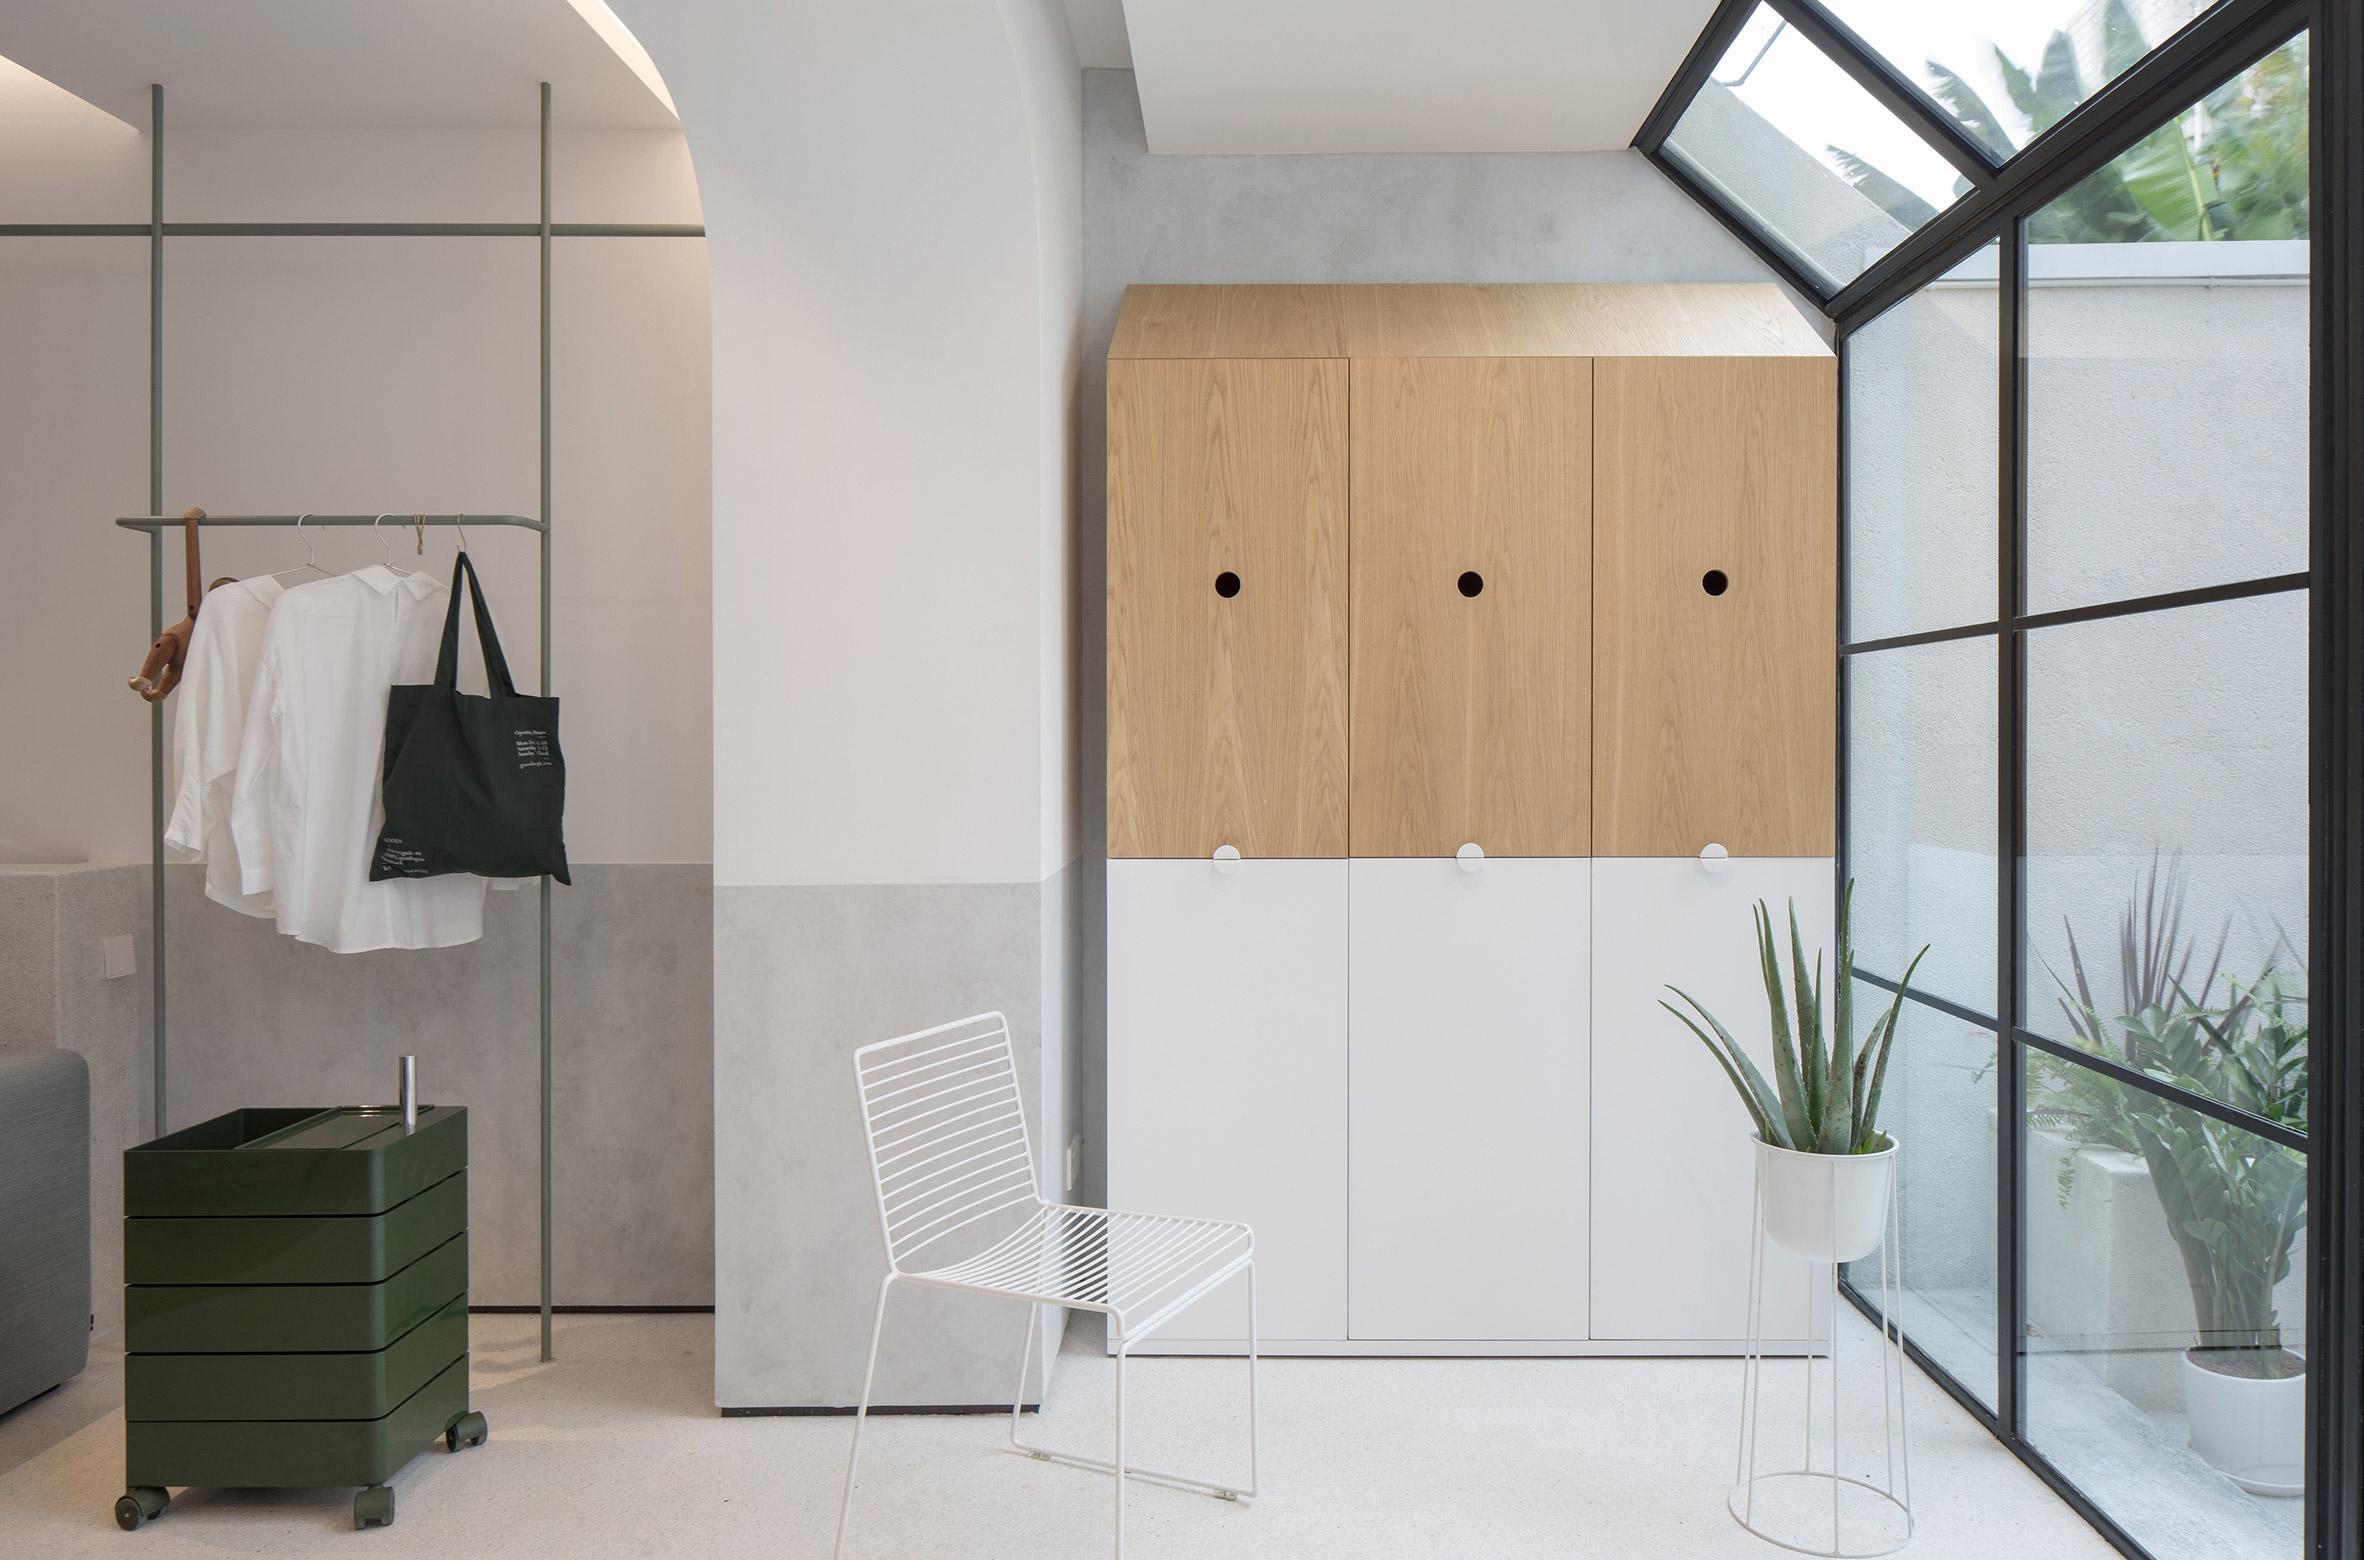 A minimalist house interior